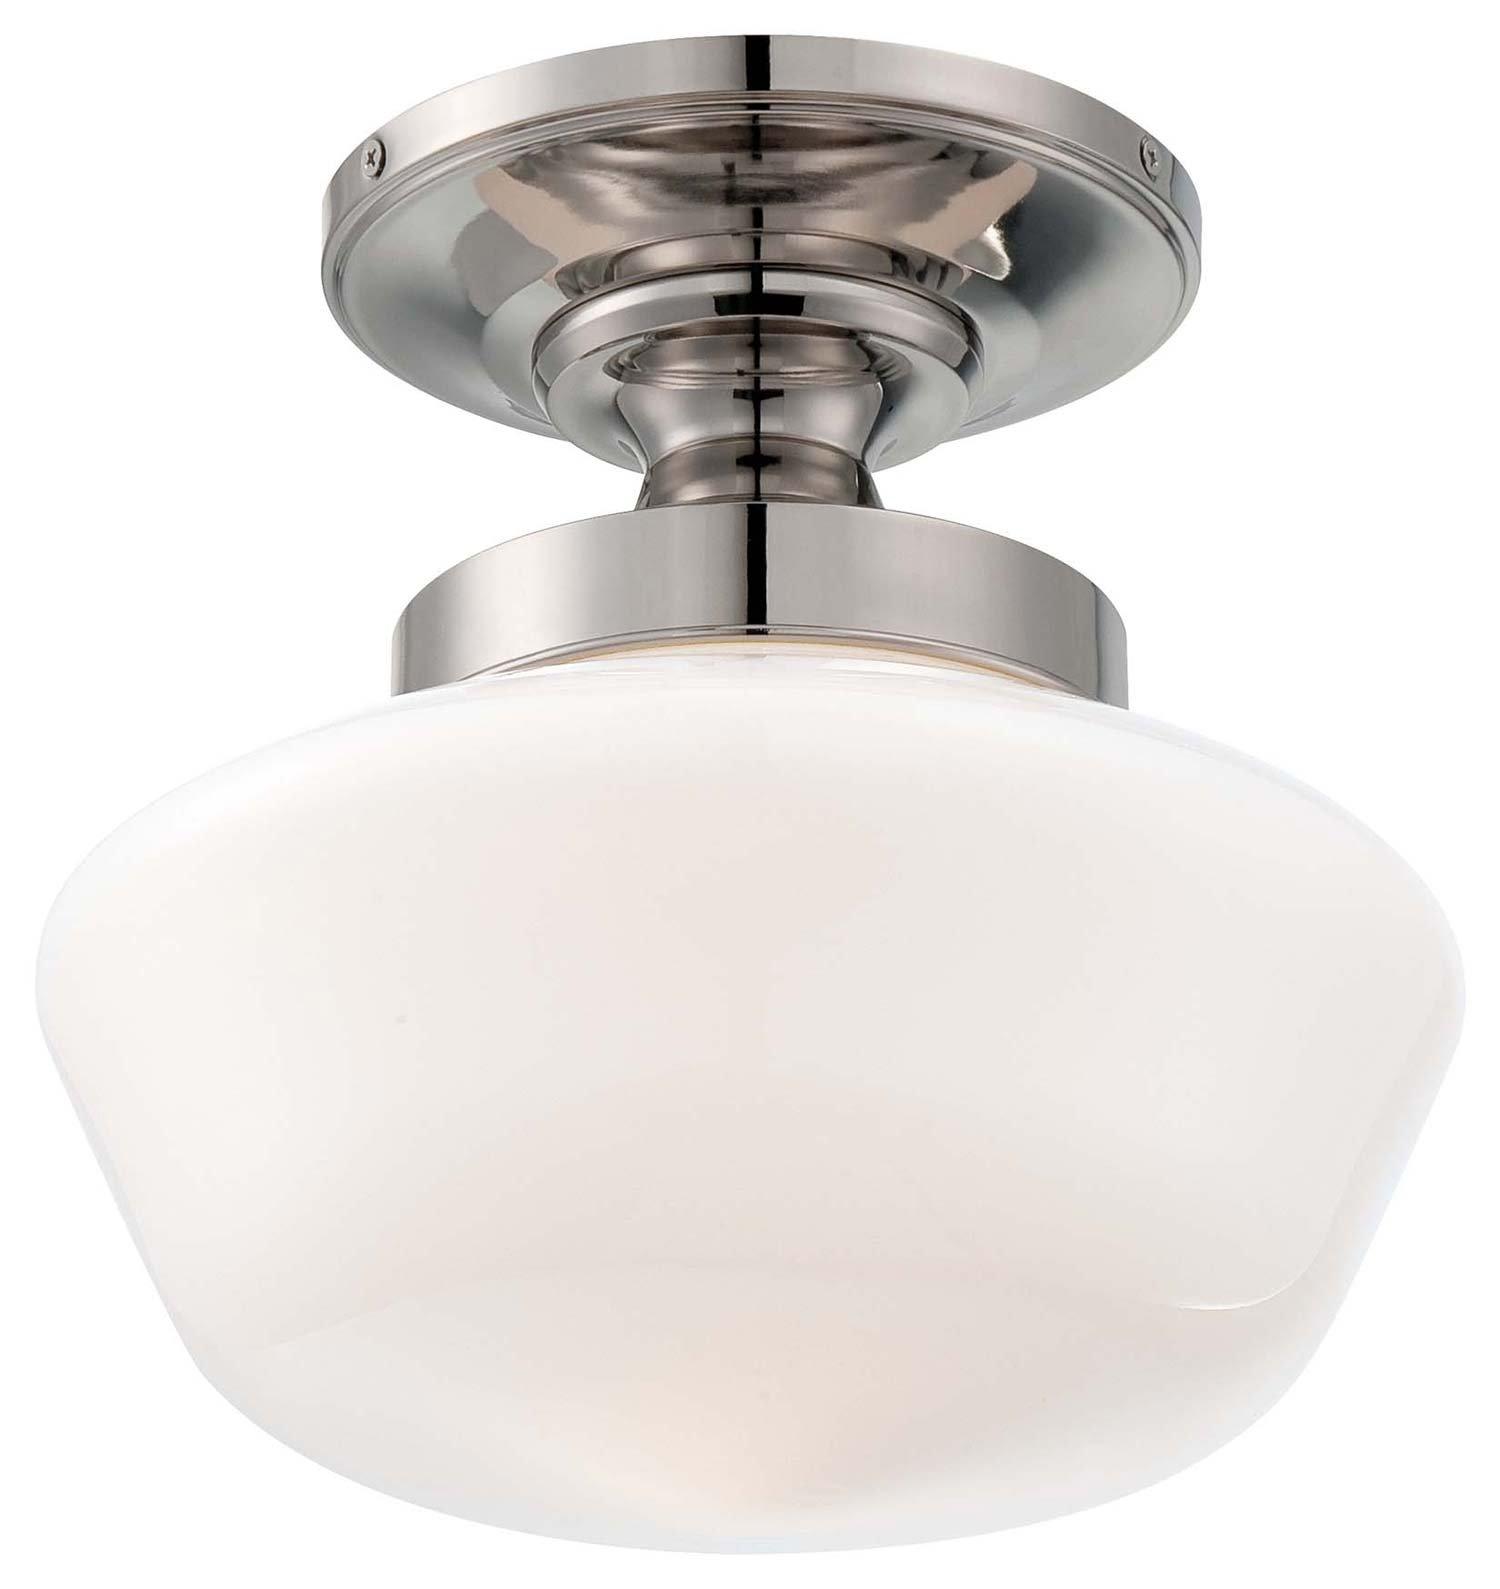 Minka Lavery 2255-613, Semi Flush Mounts Glass Semi Flush Ceiling Light, 1LT, Polished Nickel